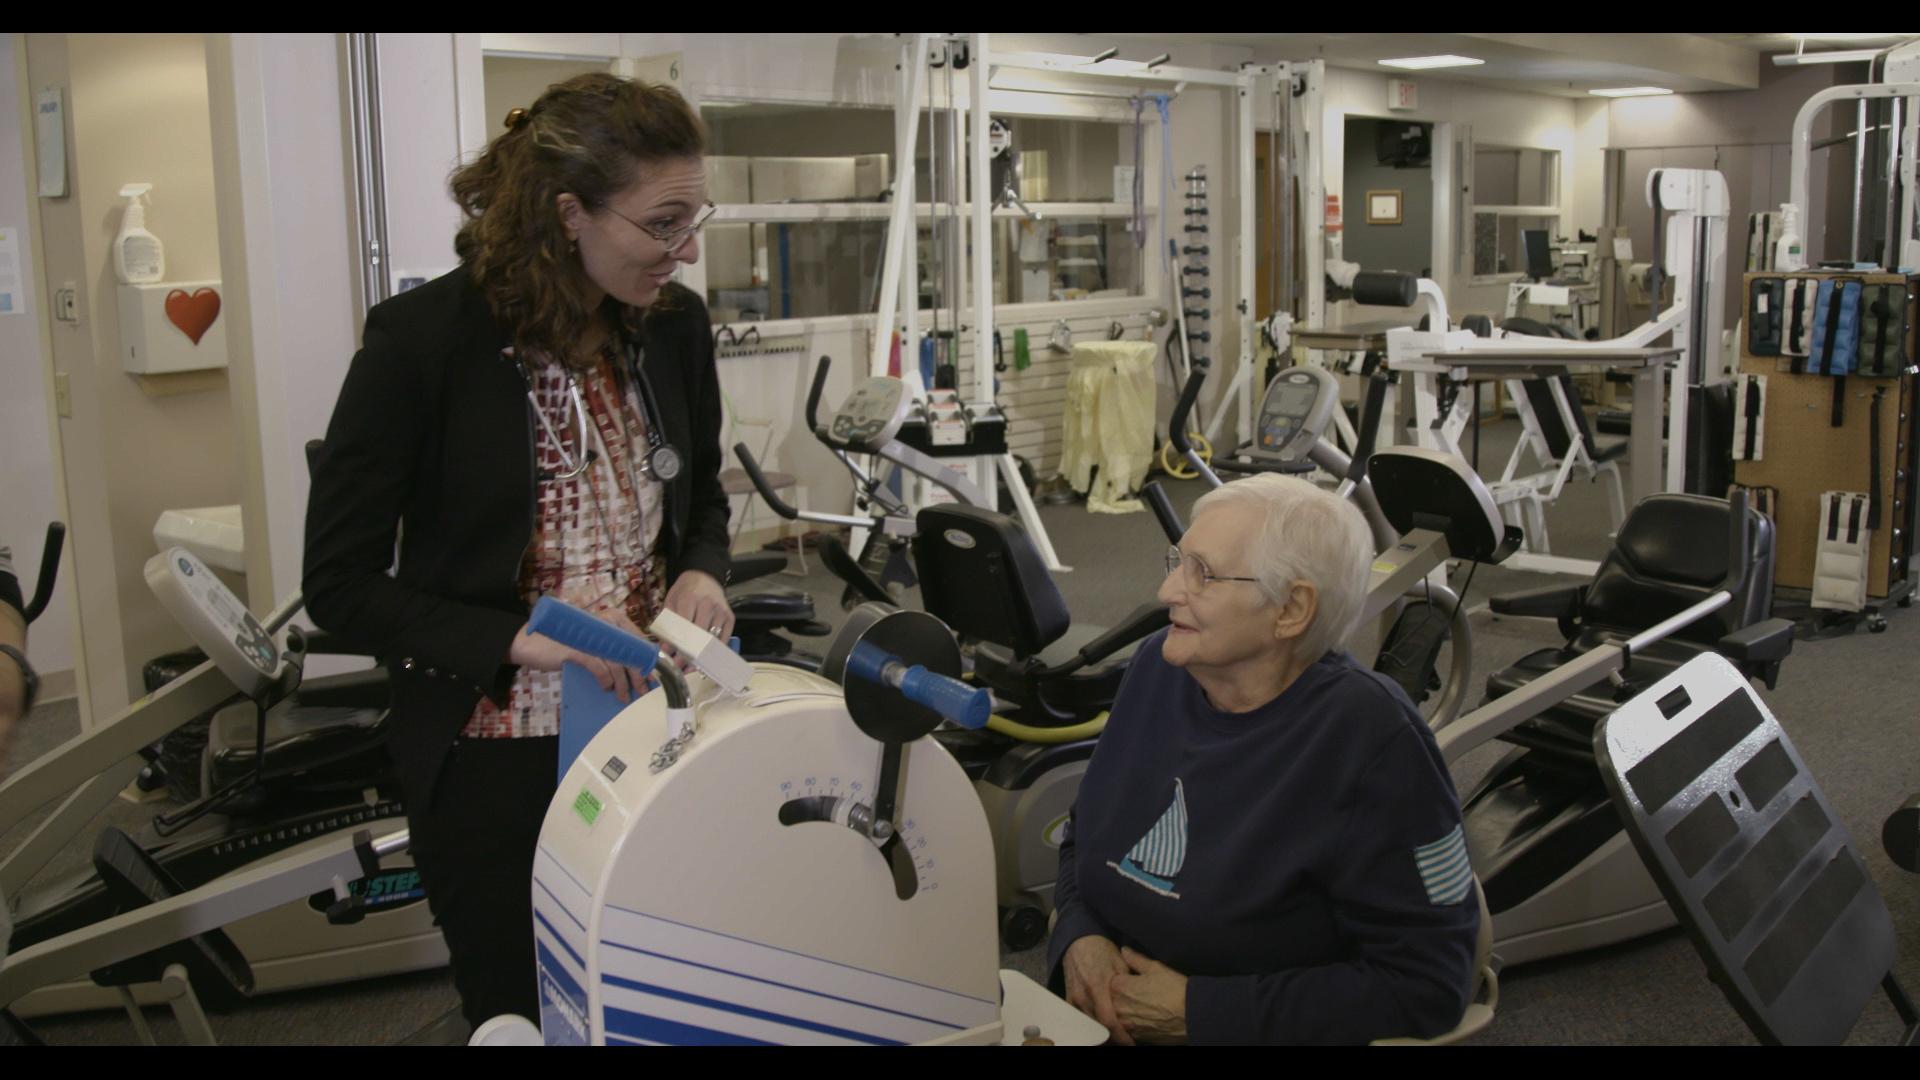 Mary and her pulmonologist, Dr. Breion Tafoya